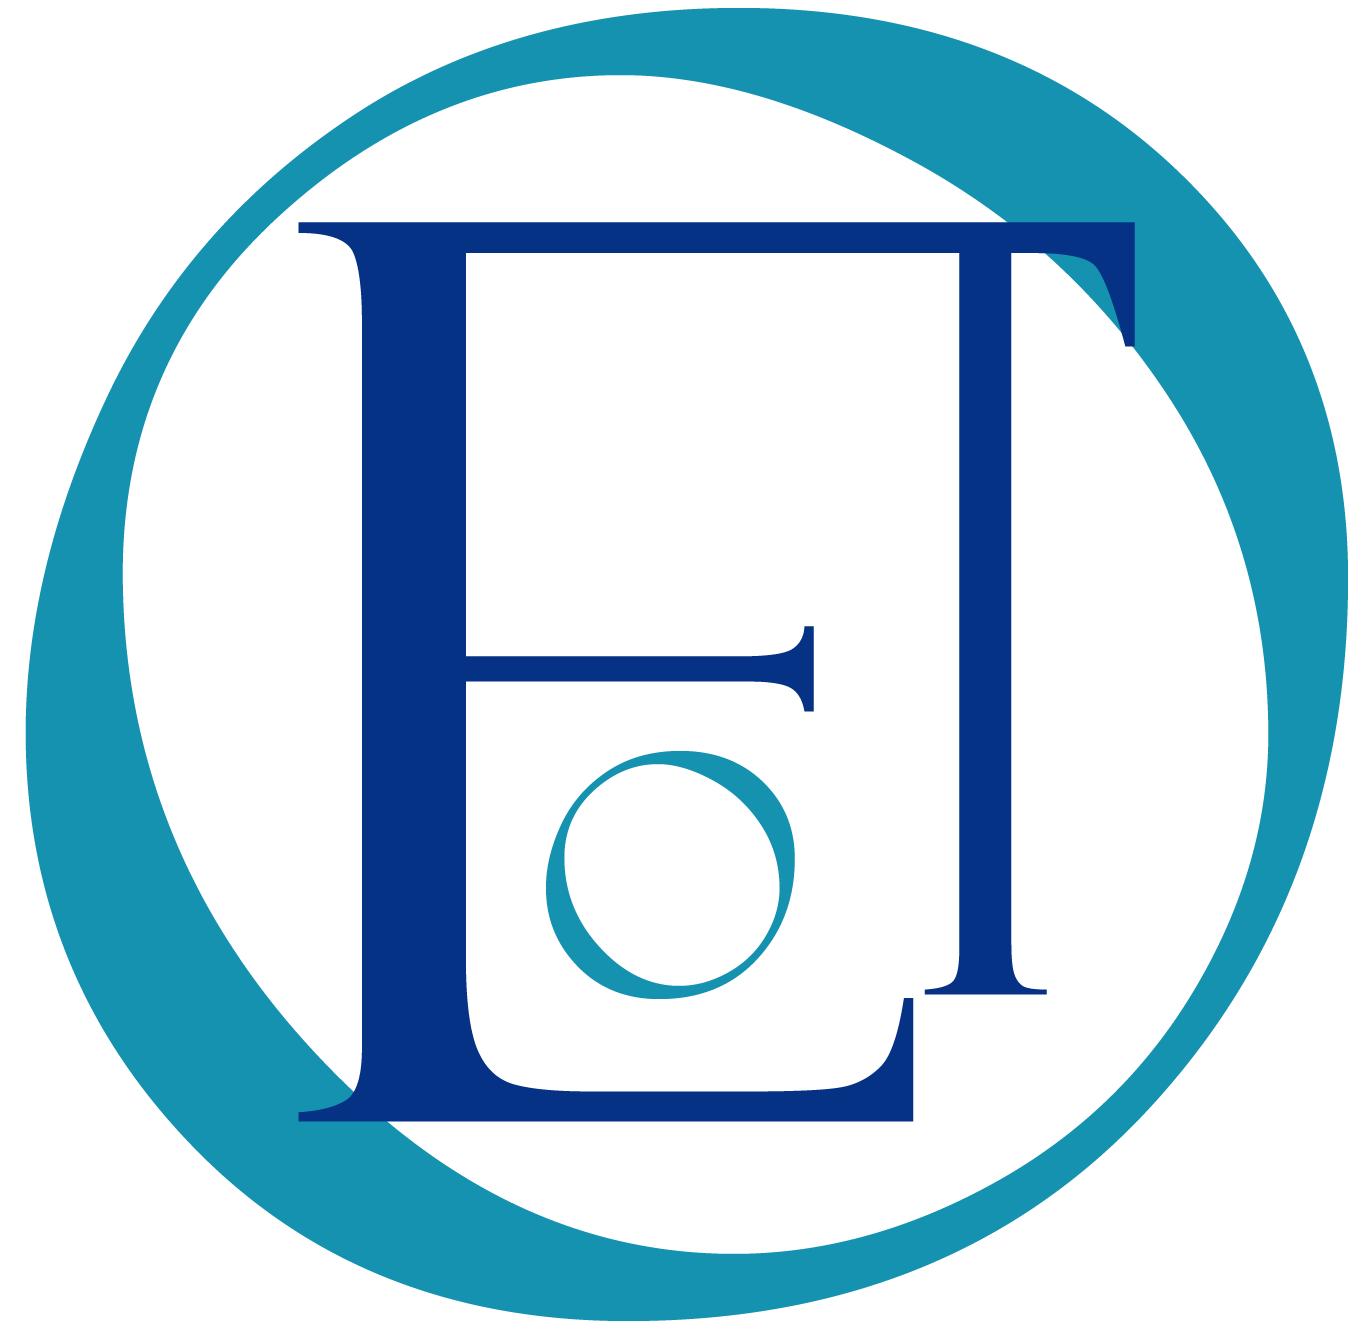 EOTO logo